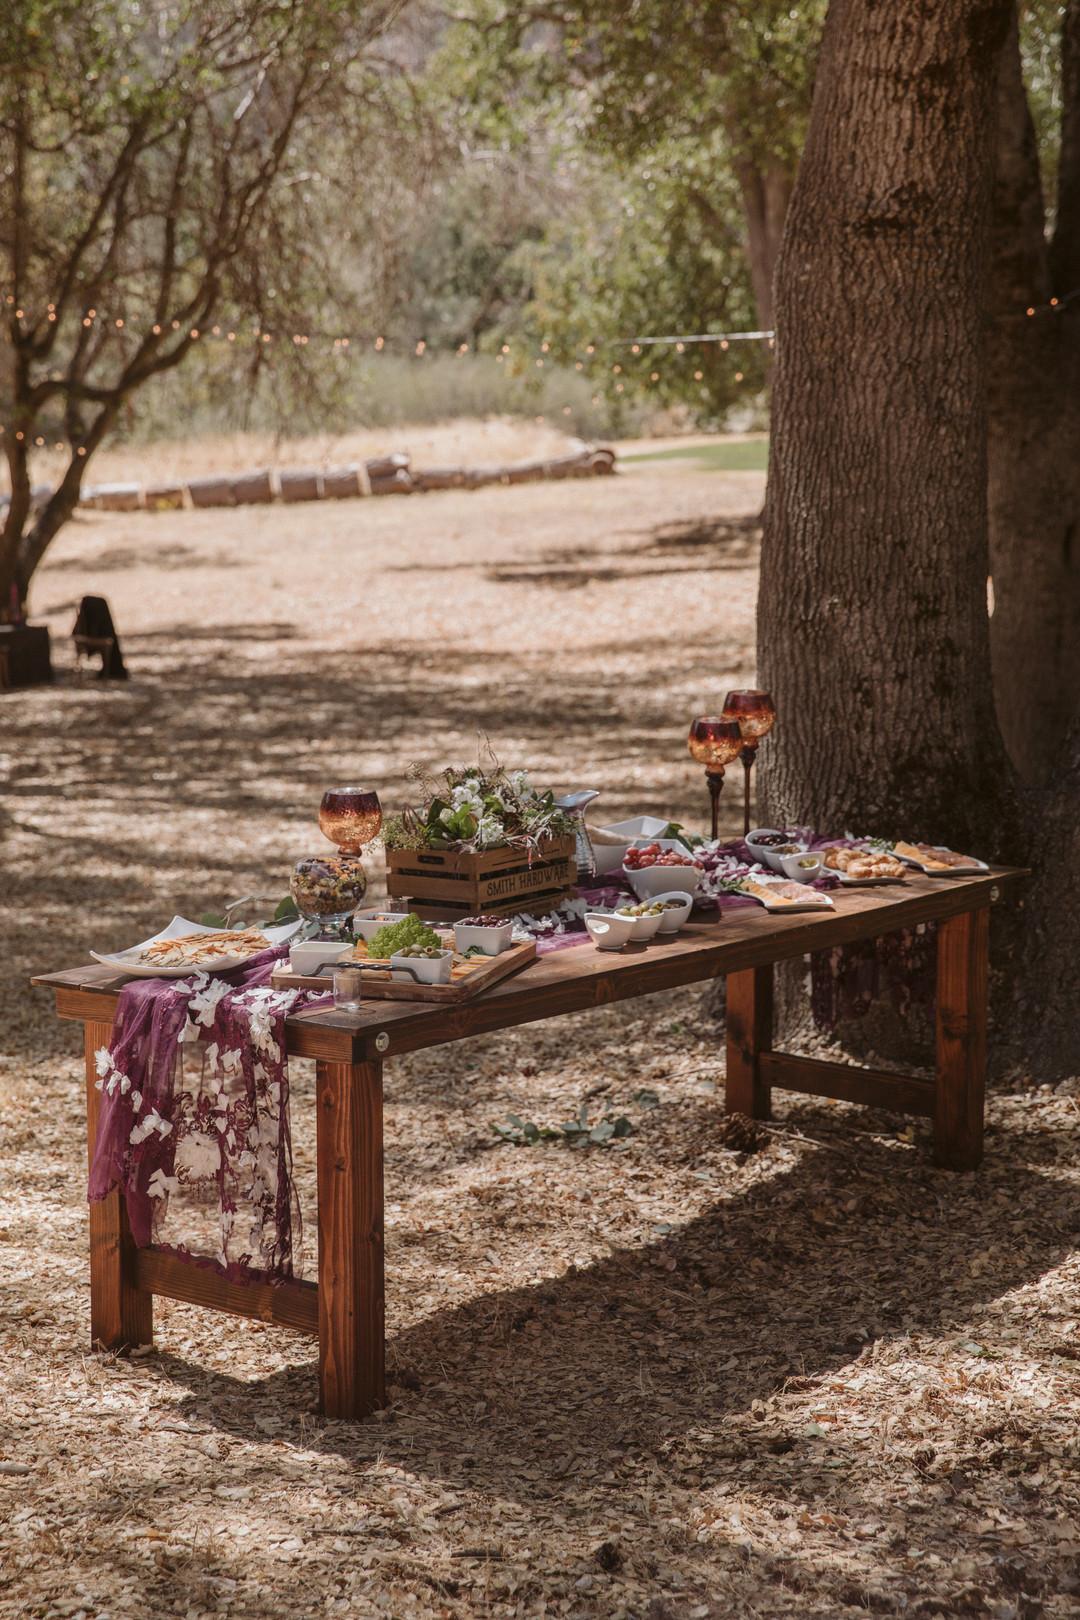 bröllop+moody+dukning+bakelse